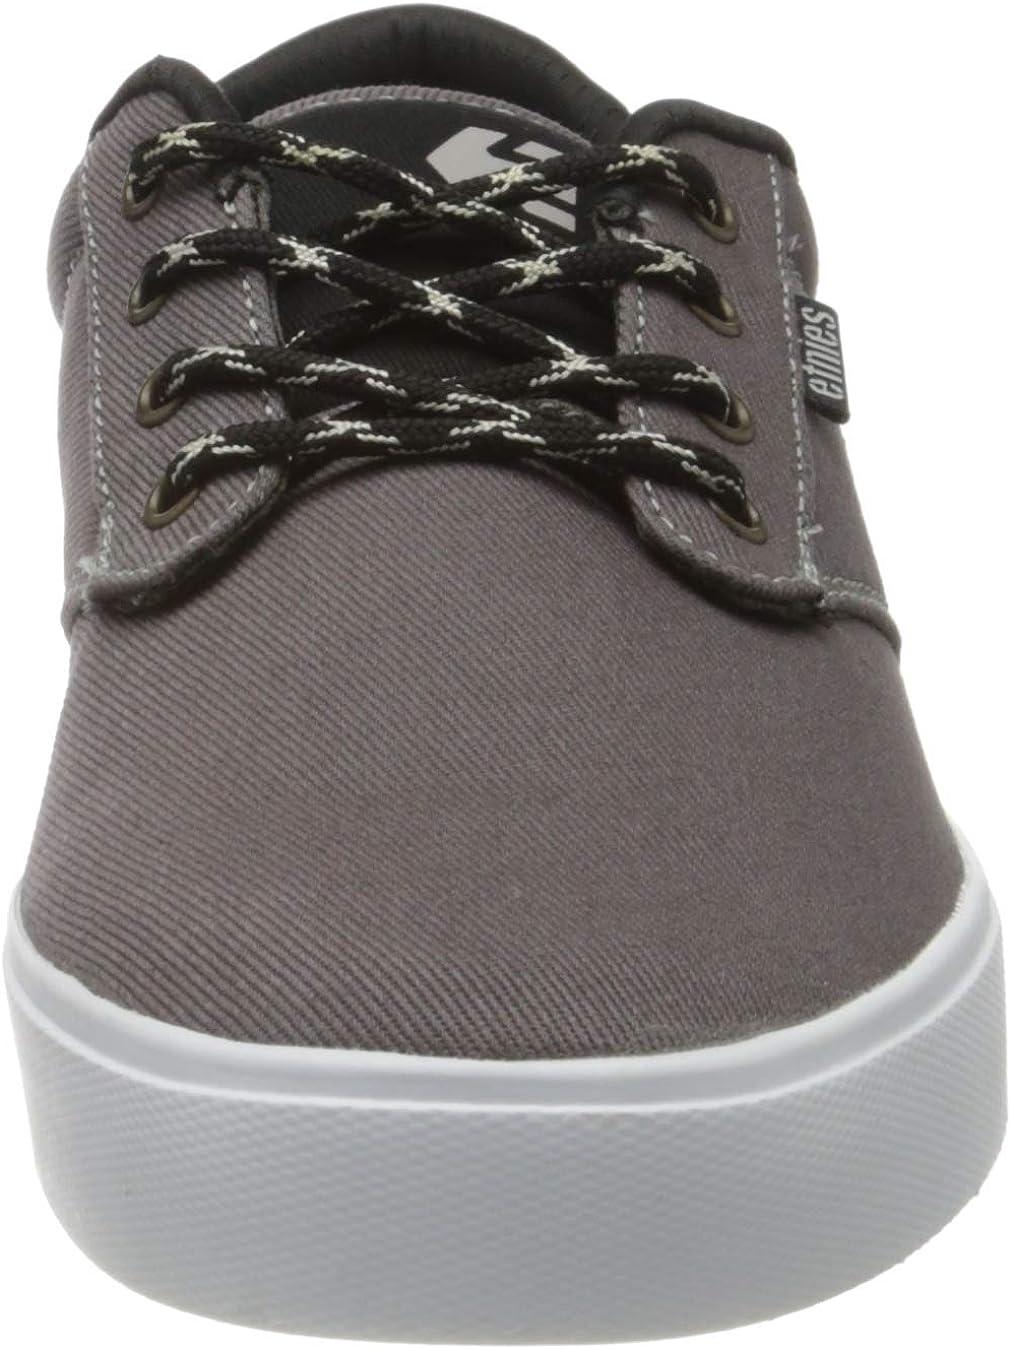 Etnies Jameson 2 ECO, Chaussures de Skateboard Homme Gris Grey Black Gold 037